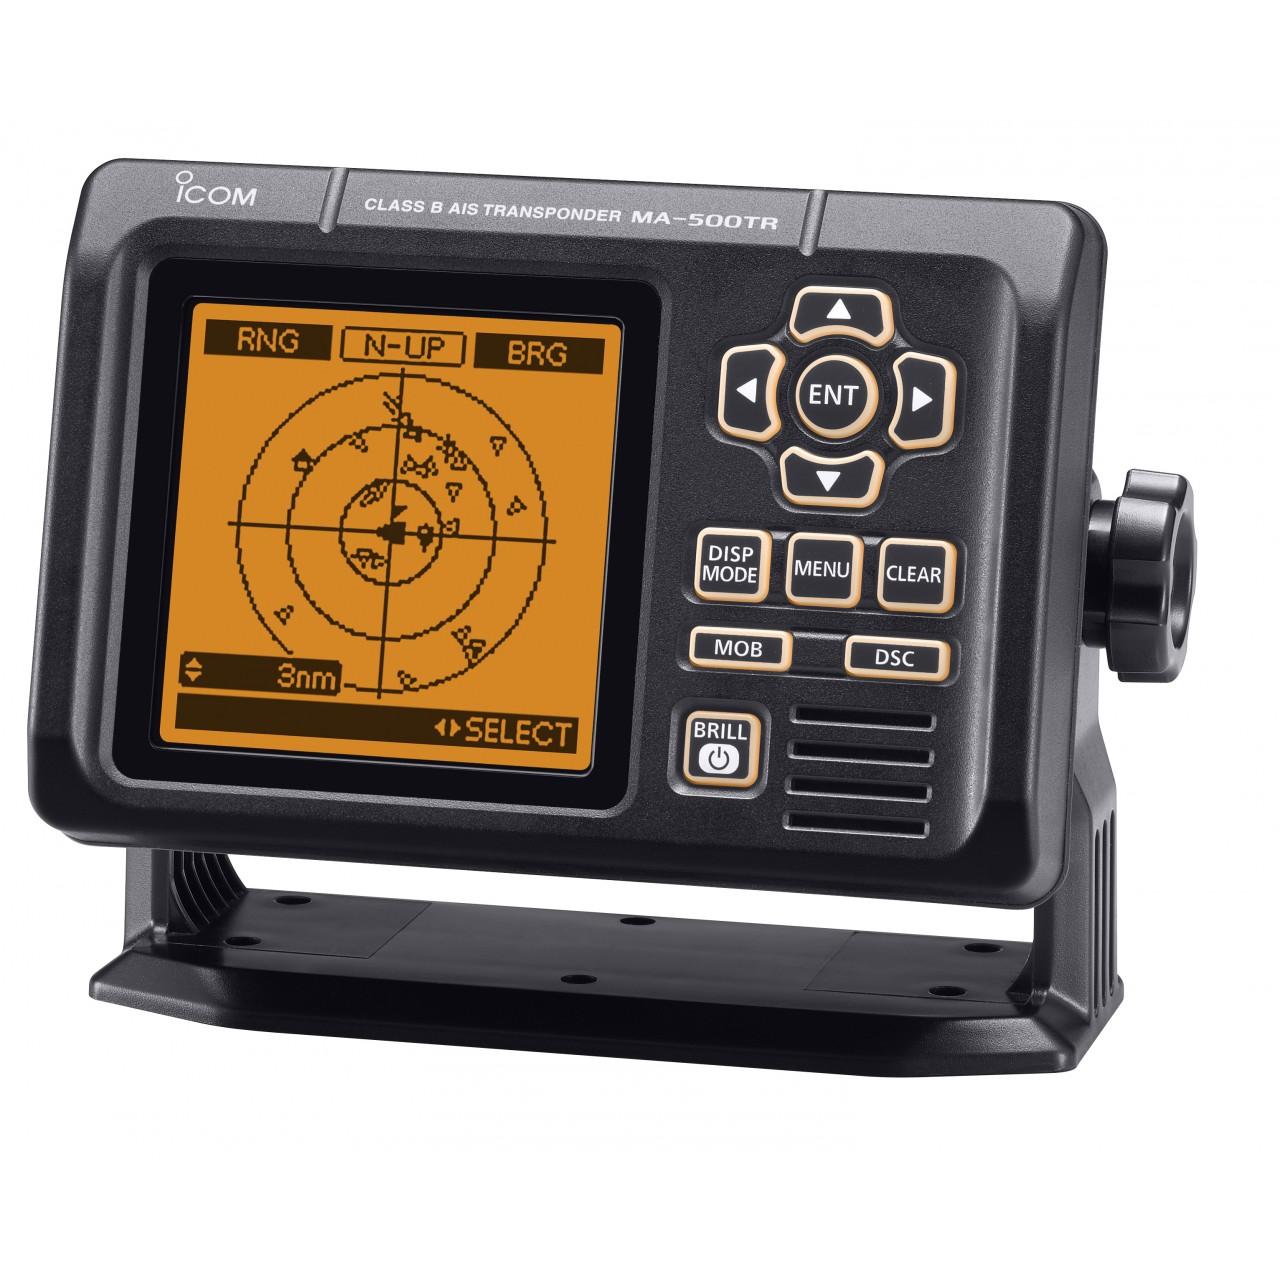 PACK-MA500TR Navigation - ICOM